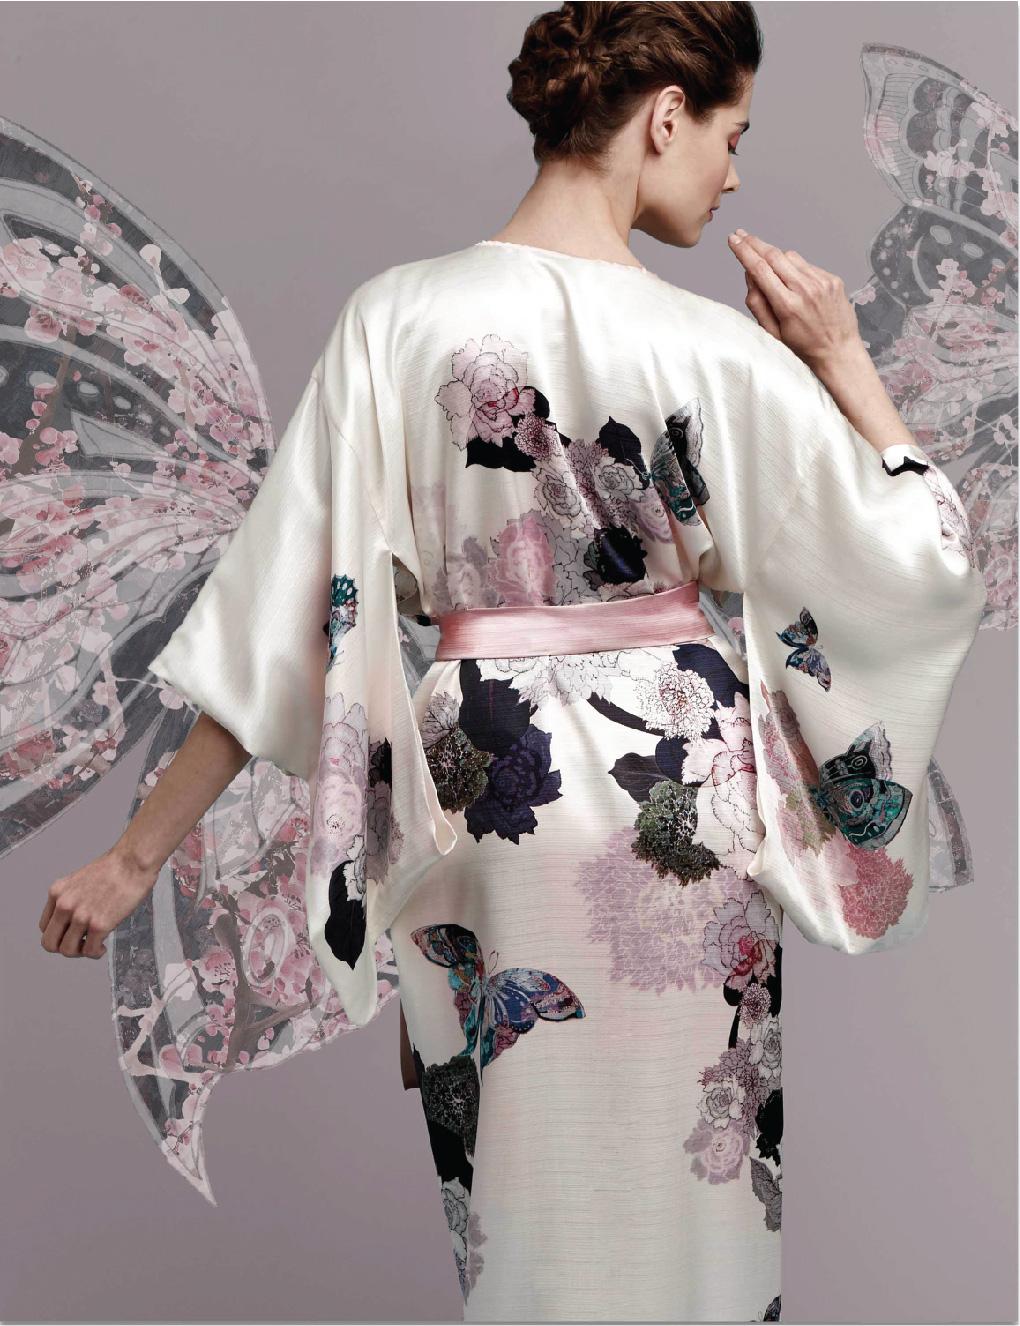 Meng-loungewear-luxury-womenswear-silk-prints-fashion-kimono-handdrawn-bloom-blossom-floral-white-pink-butterfly9.jpg